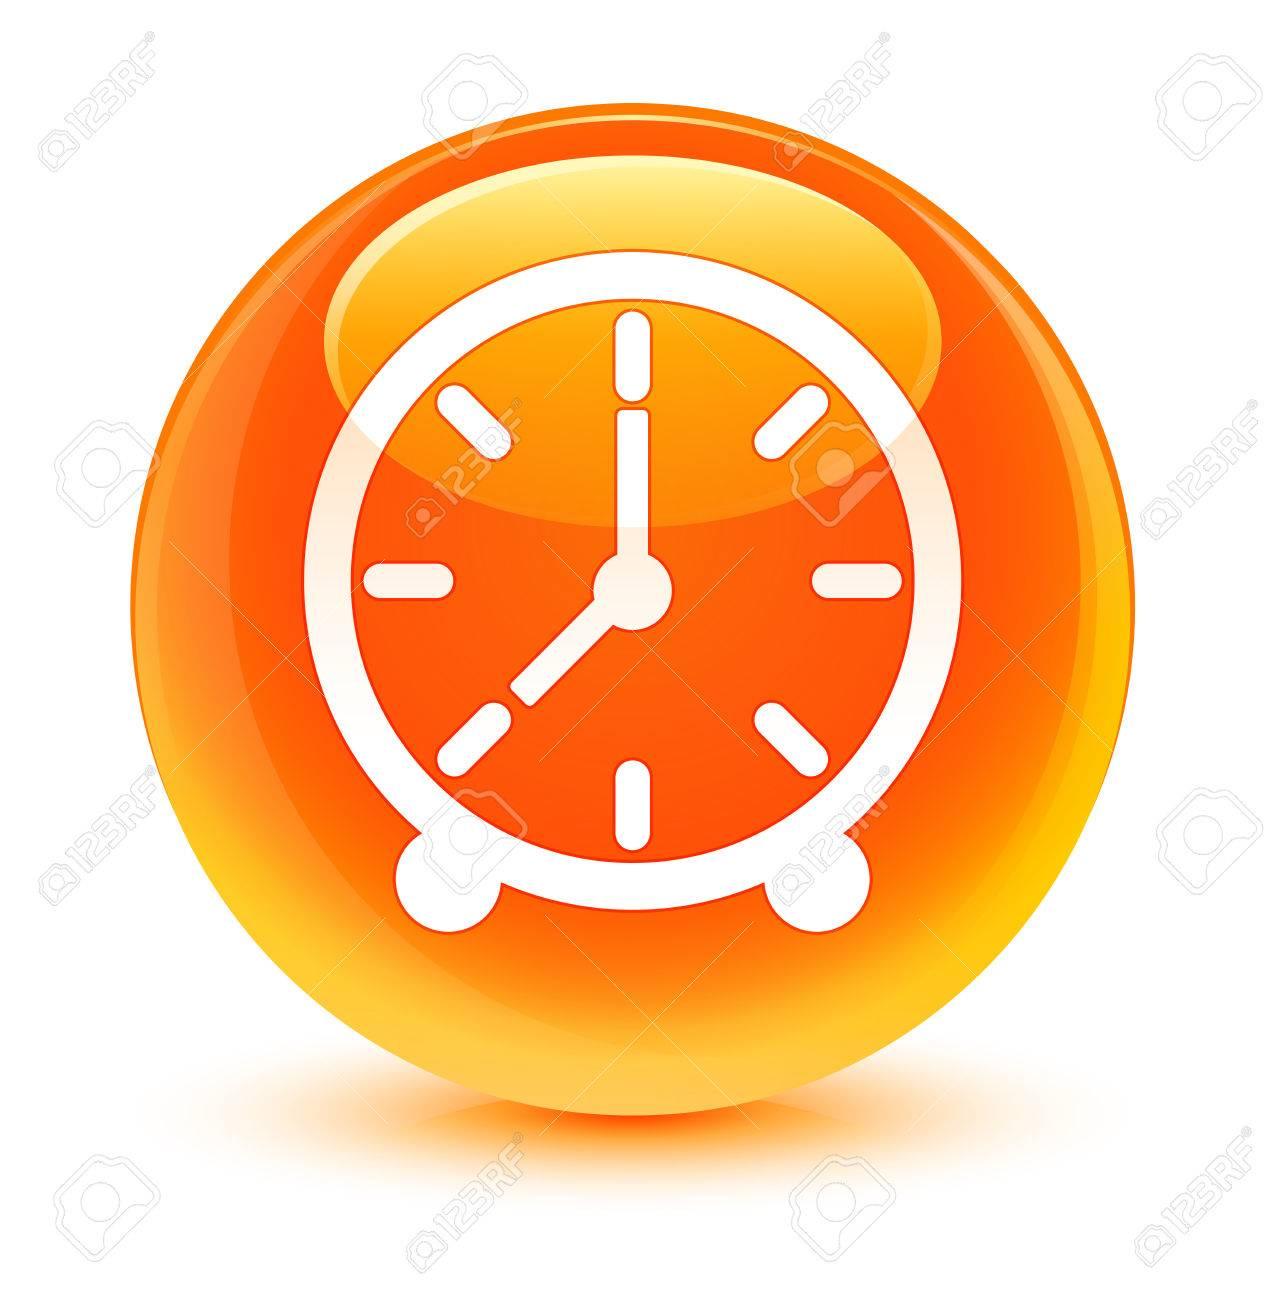 Naranja Icono Icono Botón Reloj Vidriosa EH9WD2I